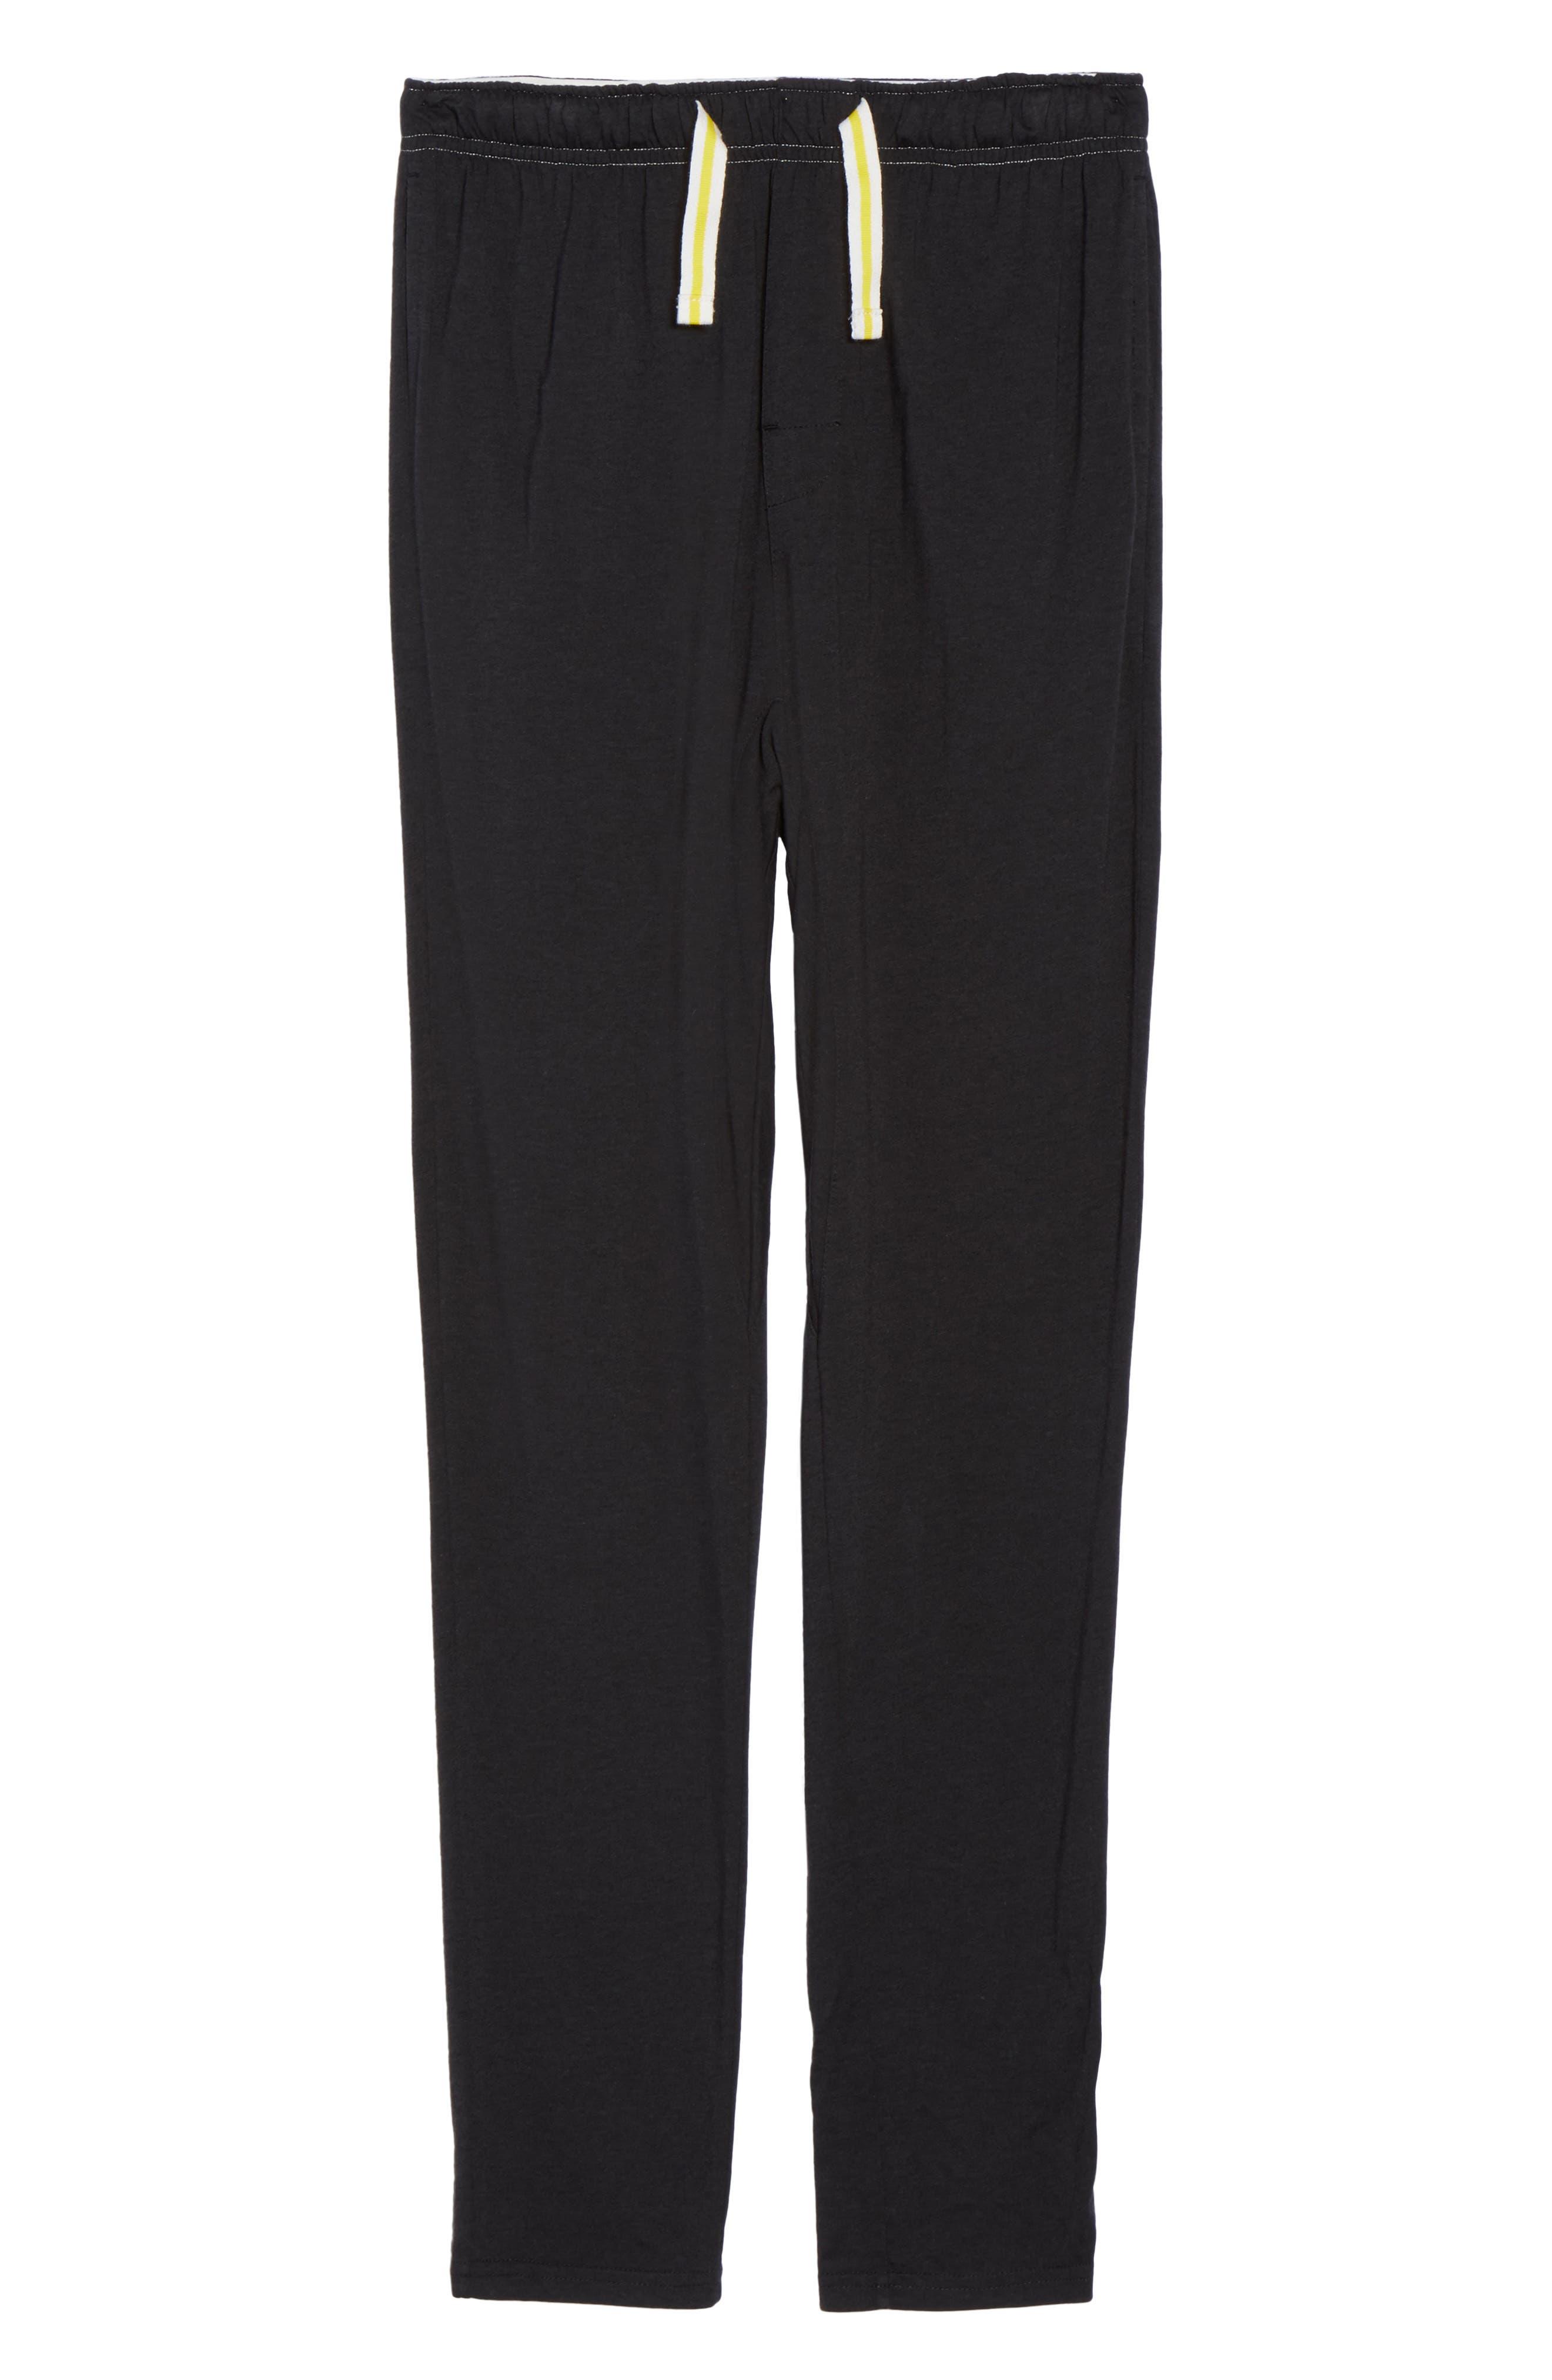 Alice Lounge Pants,                             Alternate thumbnail 4, color,                             Plain Black Marle